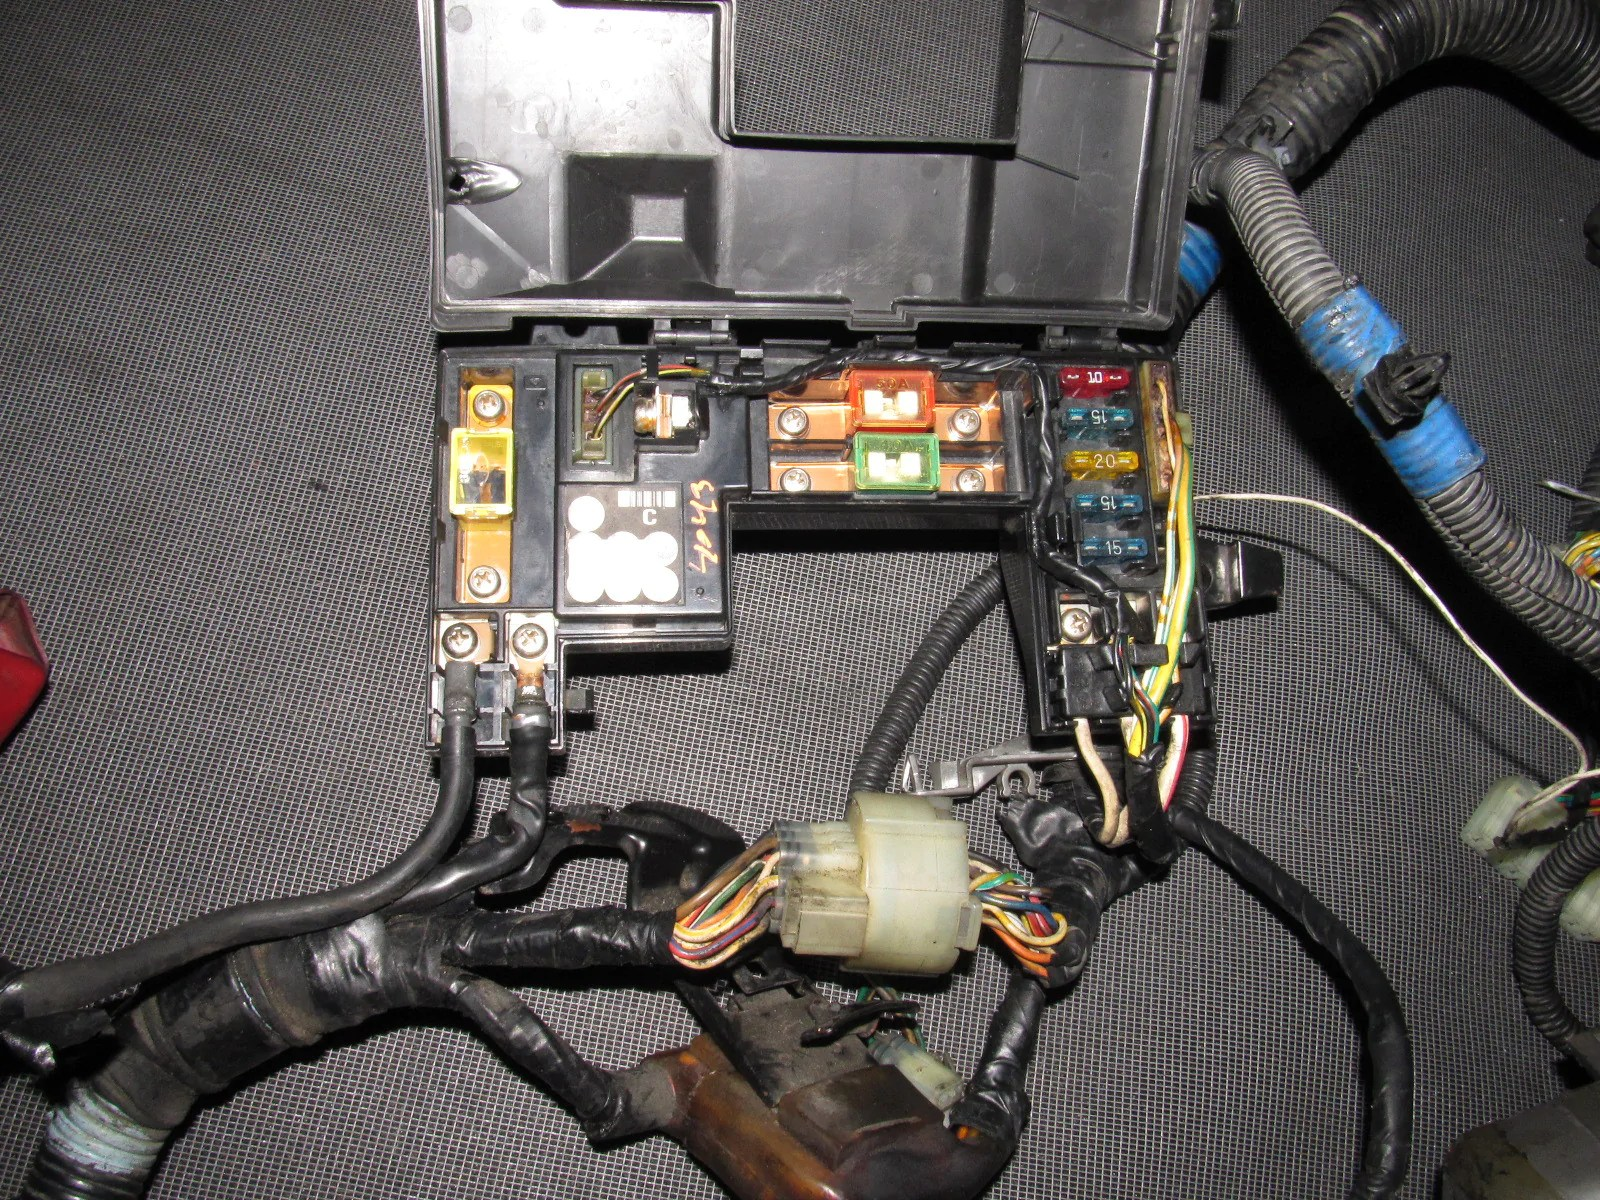 medium resolution of honda crx wiring harness wiring diagram expert honda crx wiring harness